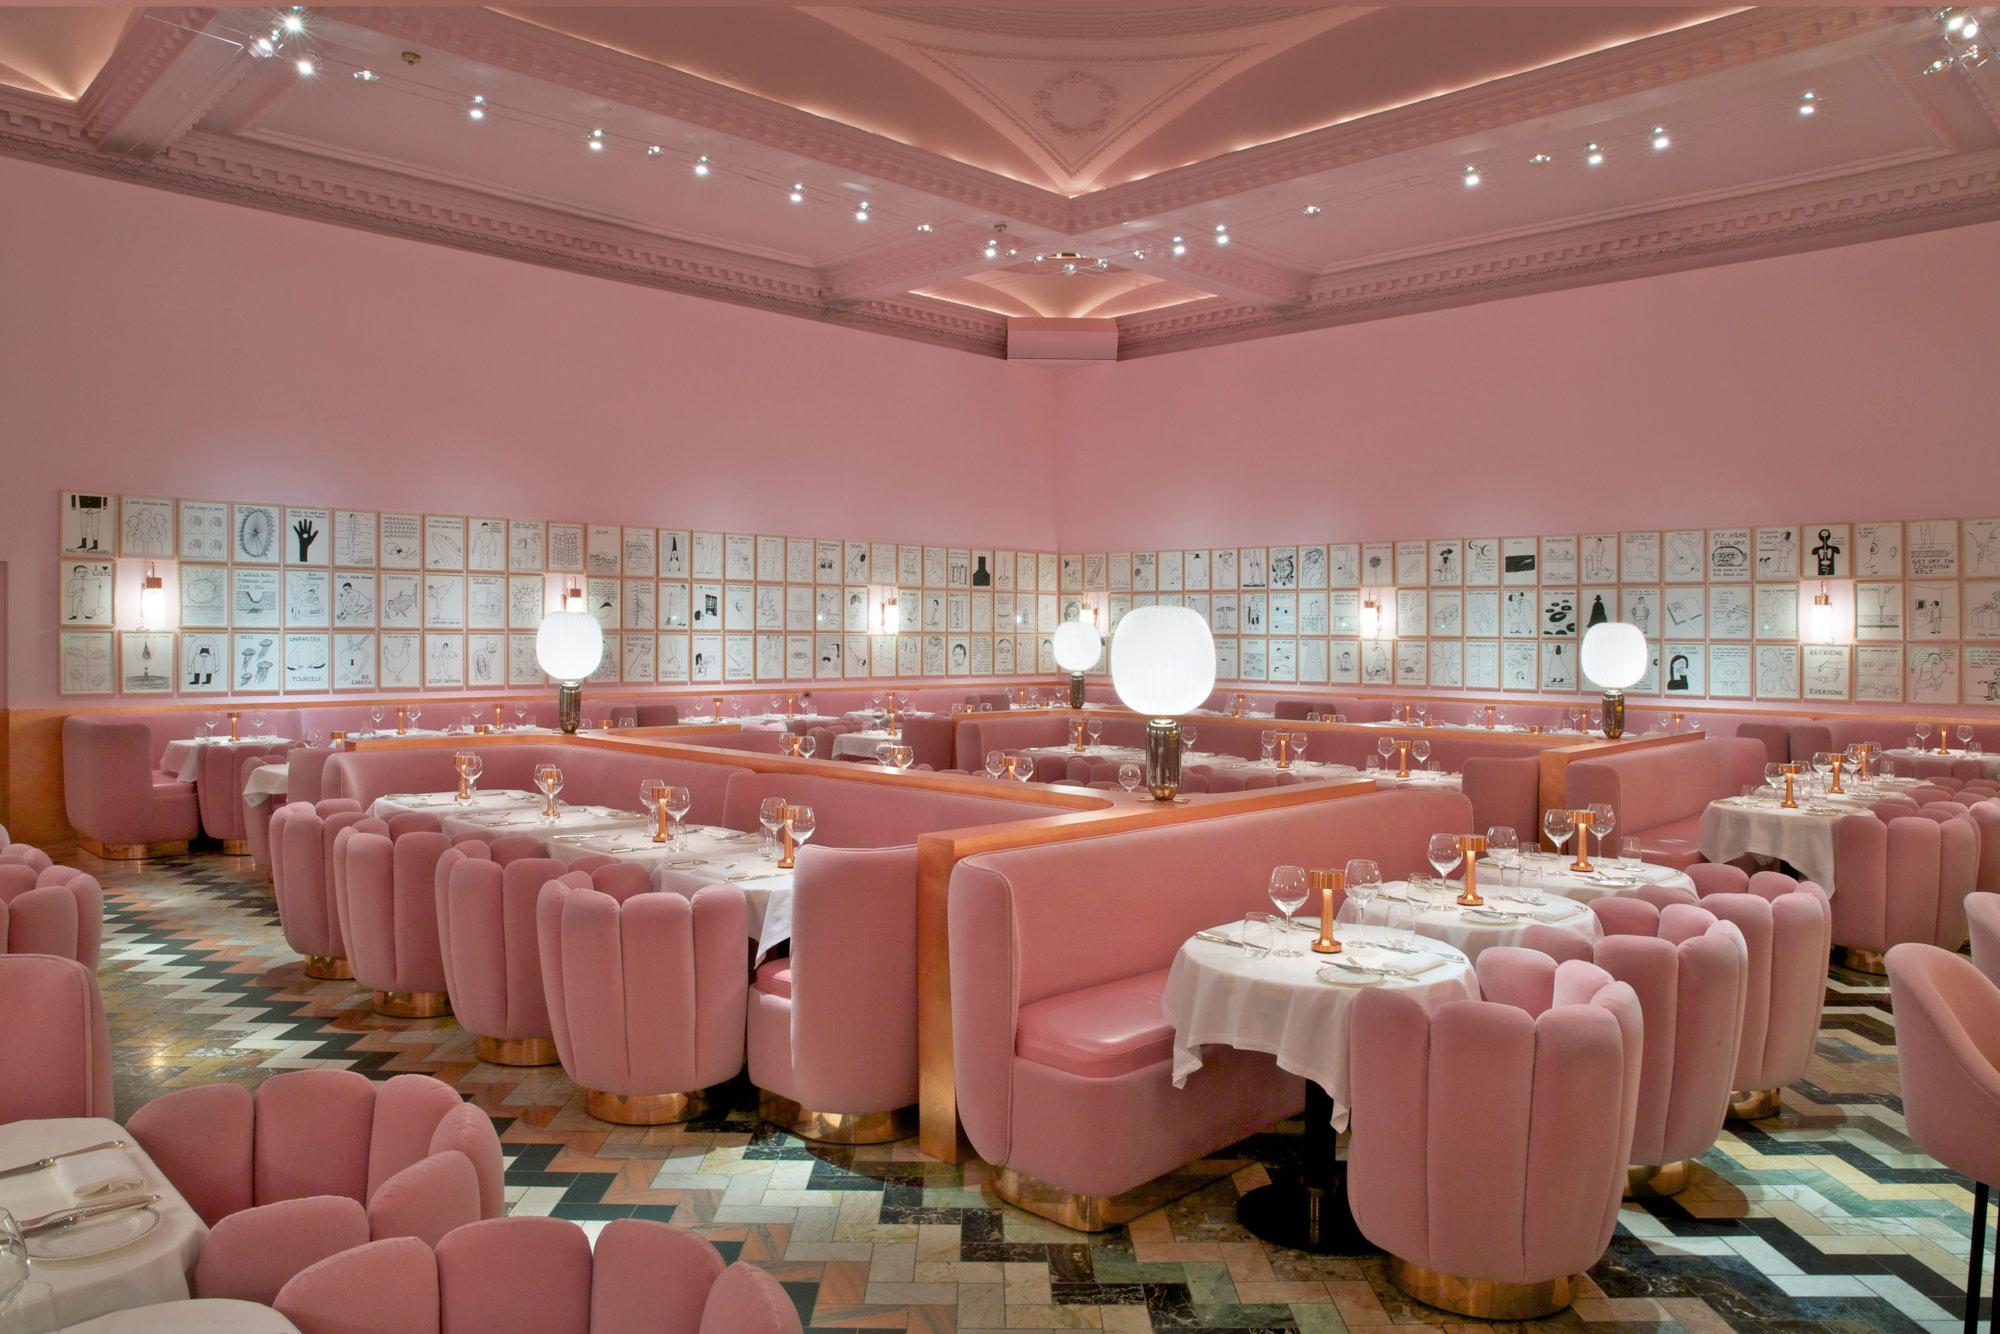 india_mahdavi_the-gallery-at-sketch_2014_restaurant_bar_architecture_design_interior-2000x1334.jpg